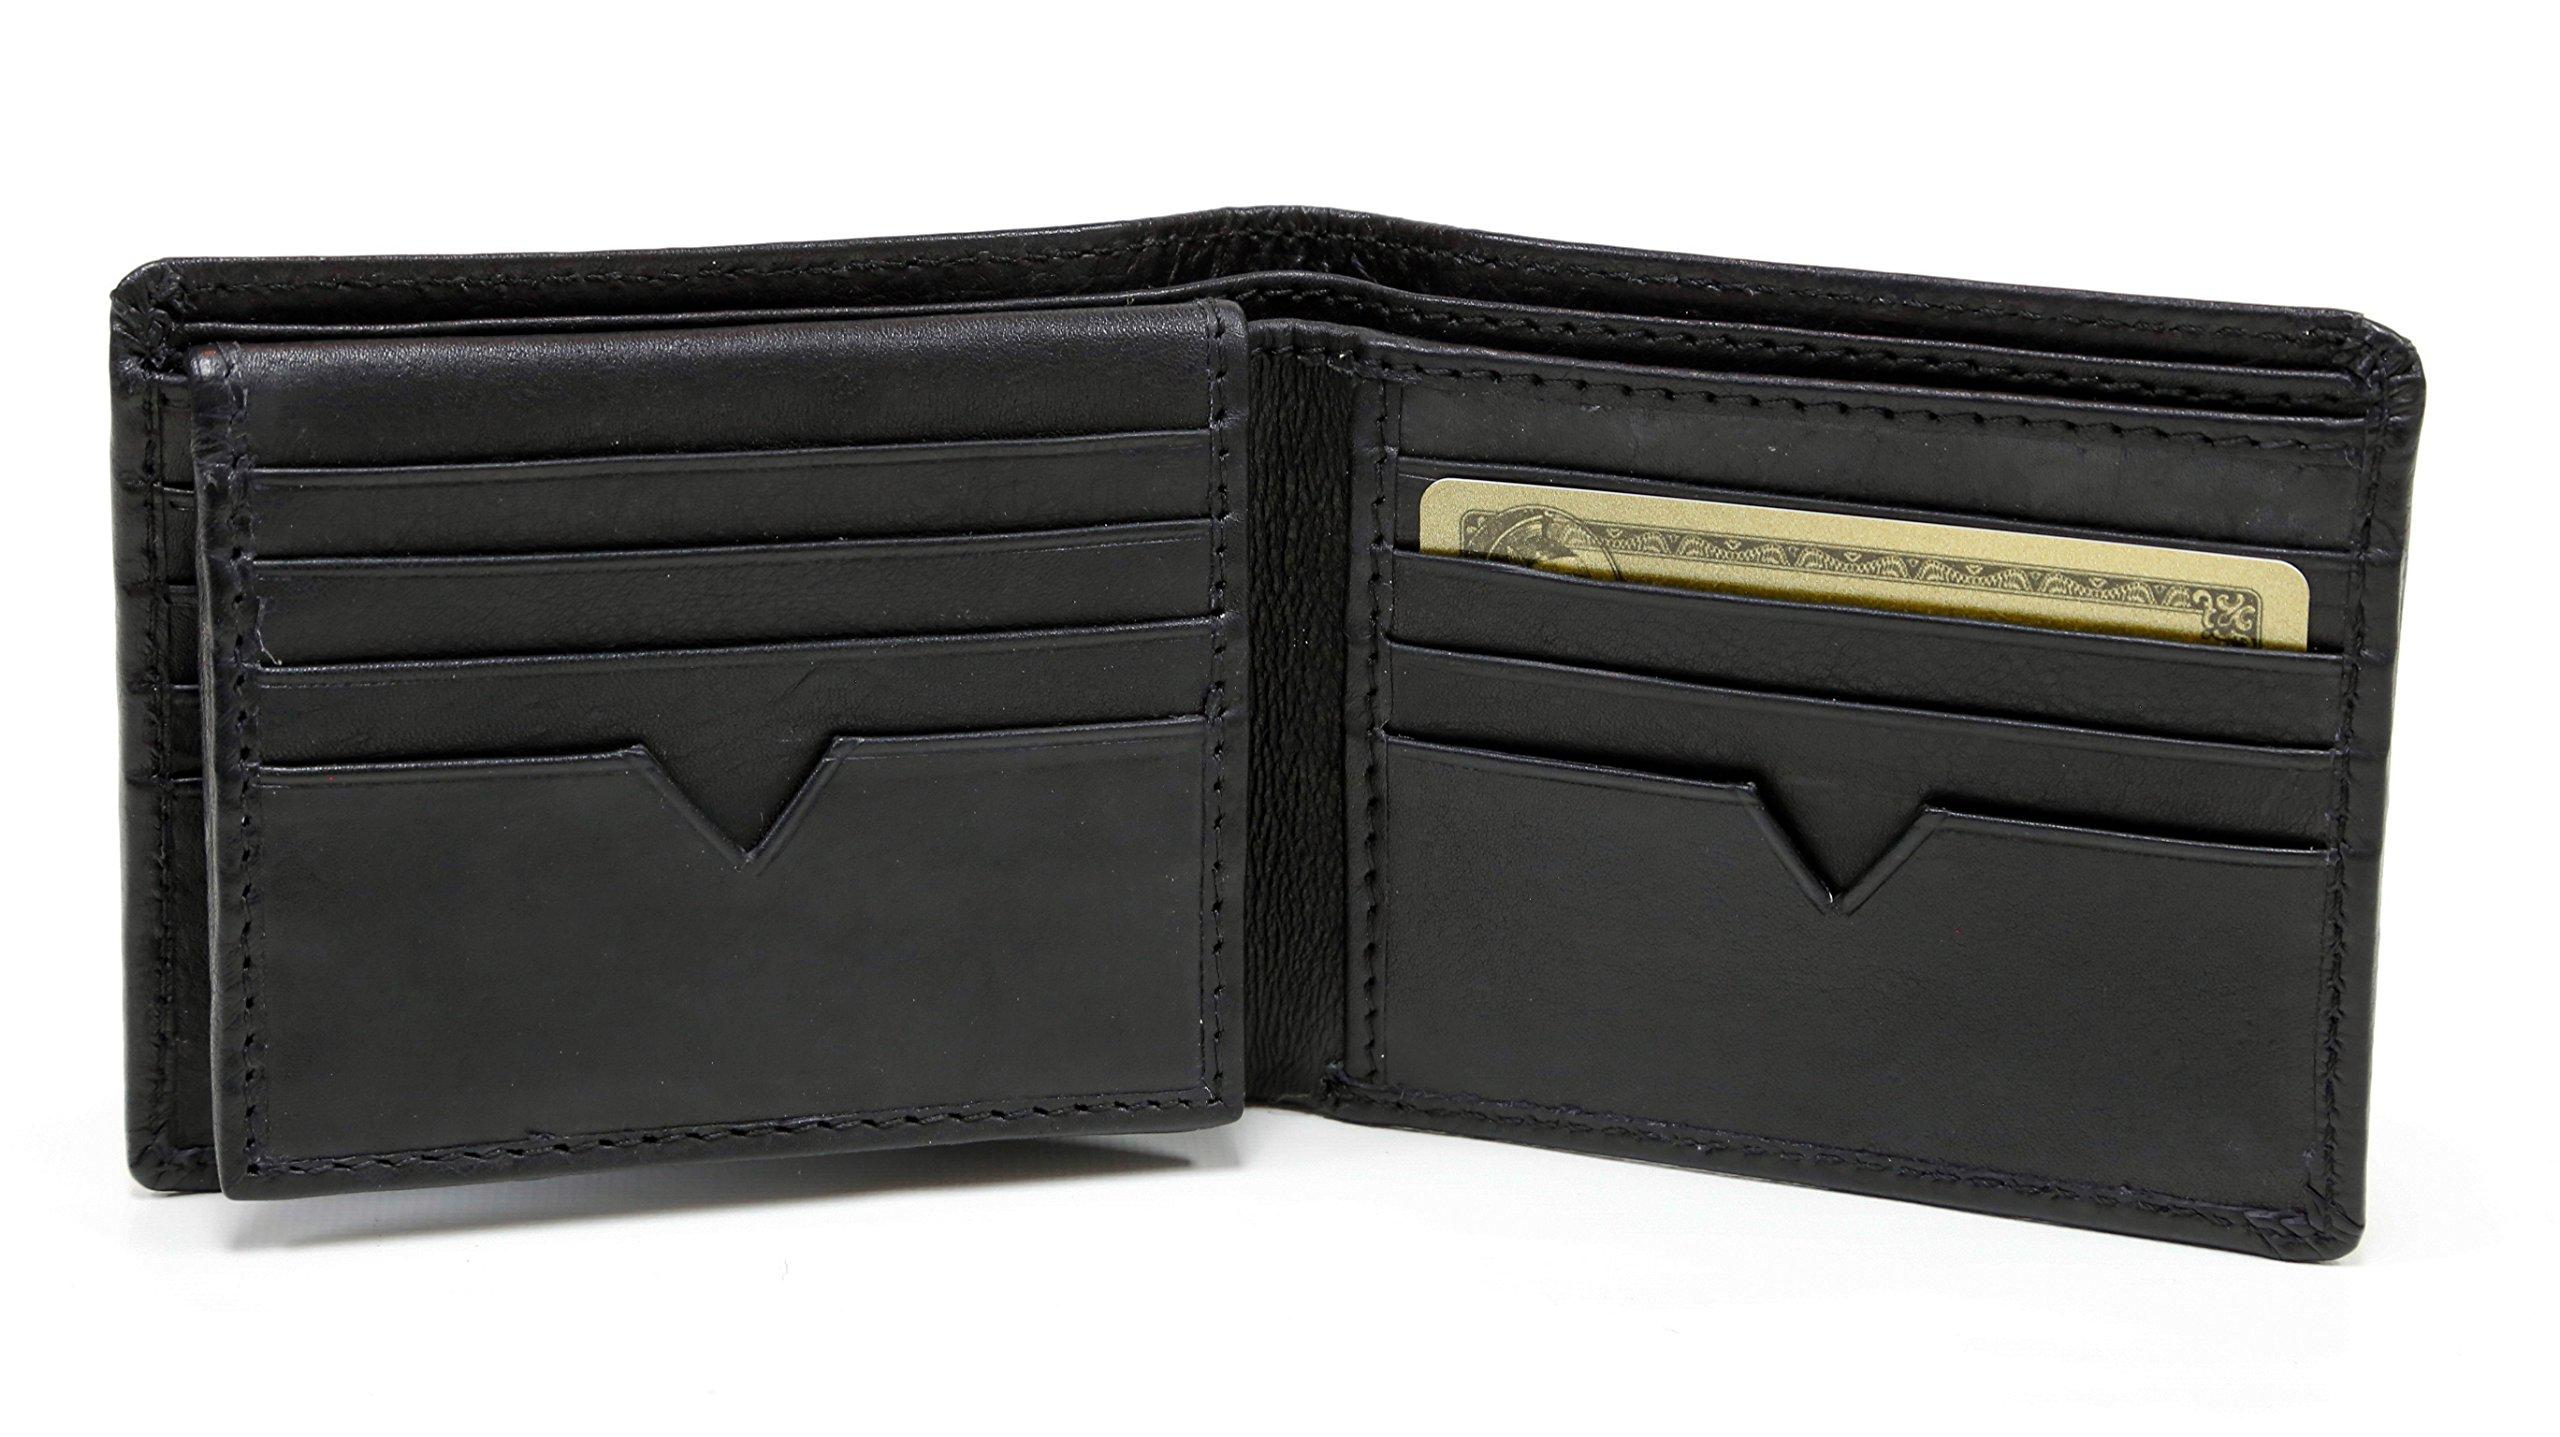 Ashlin Genuine Leather 16 Credit Card Slots Wallet, Black by ASHLIN